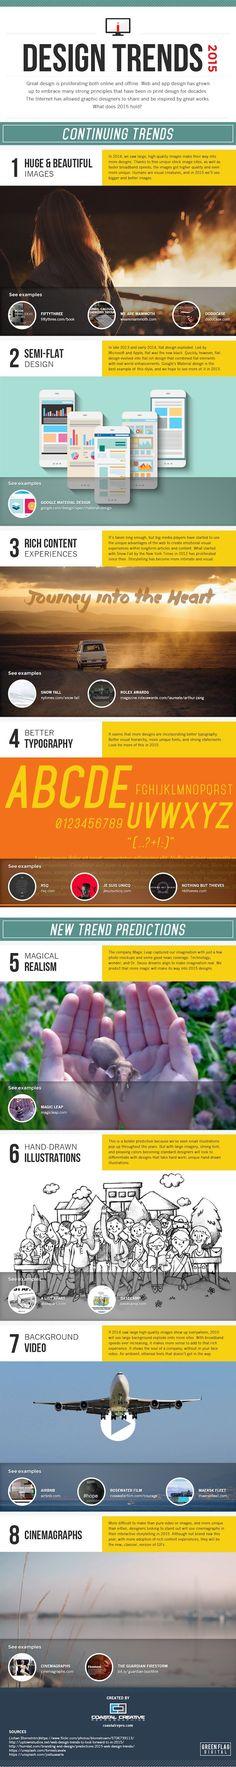 8 Design Trends to Watch in 2015 [Infographic], via @HubSpot